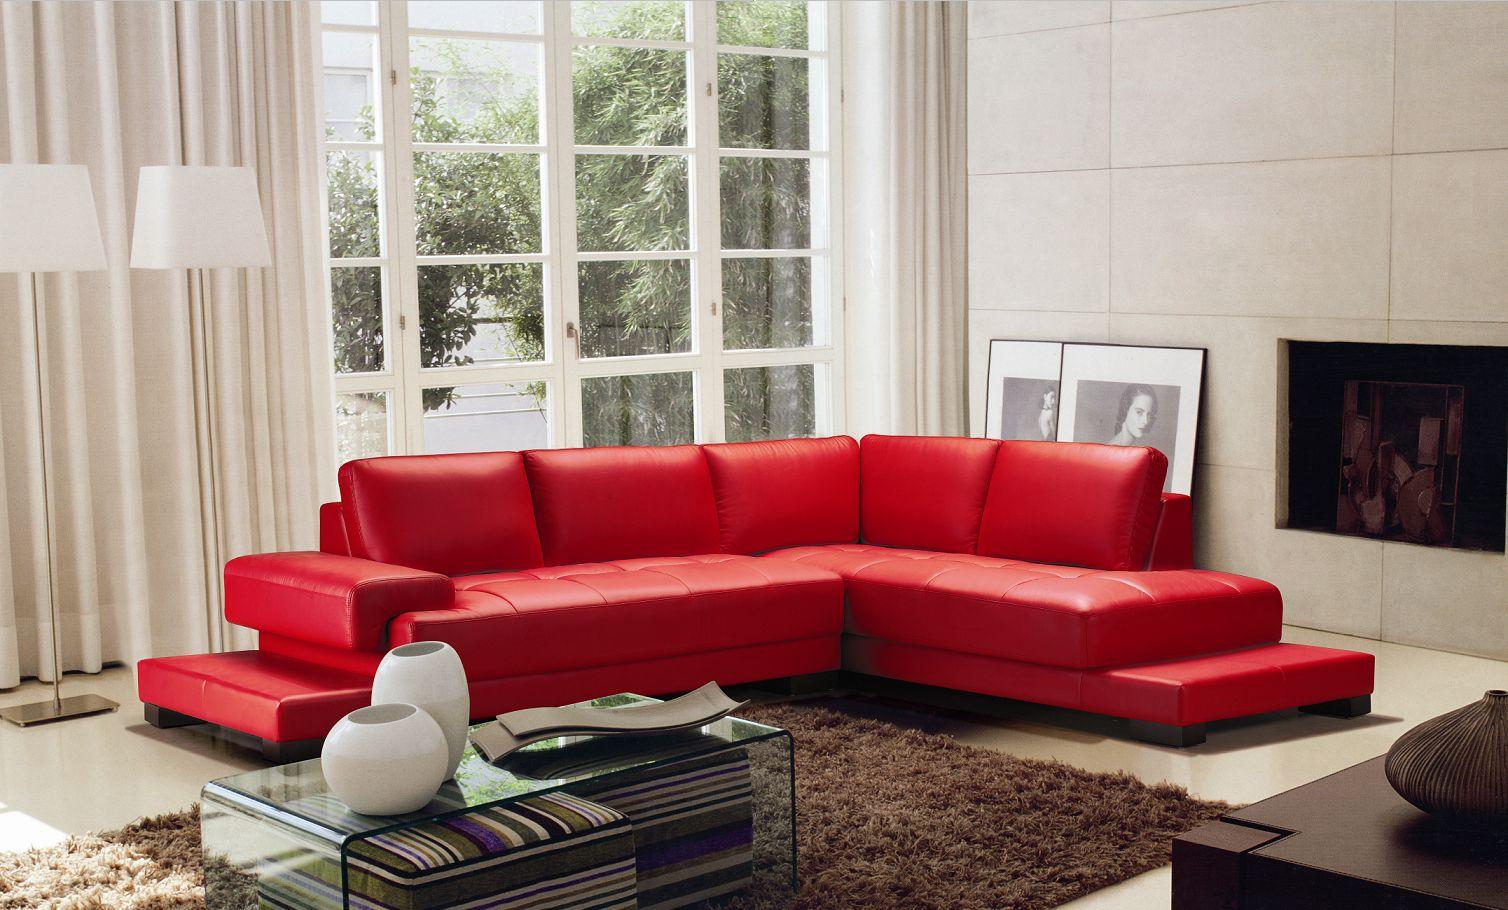 Farah prochaska, interior stylist where: 2226 Red Sofa Set   Black Design Co